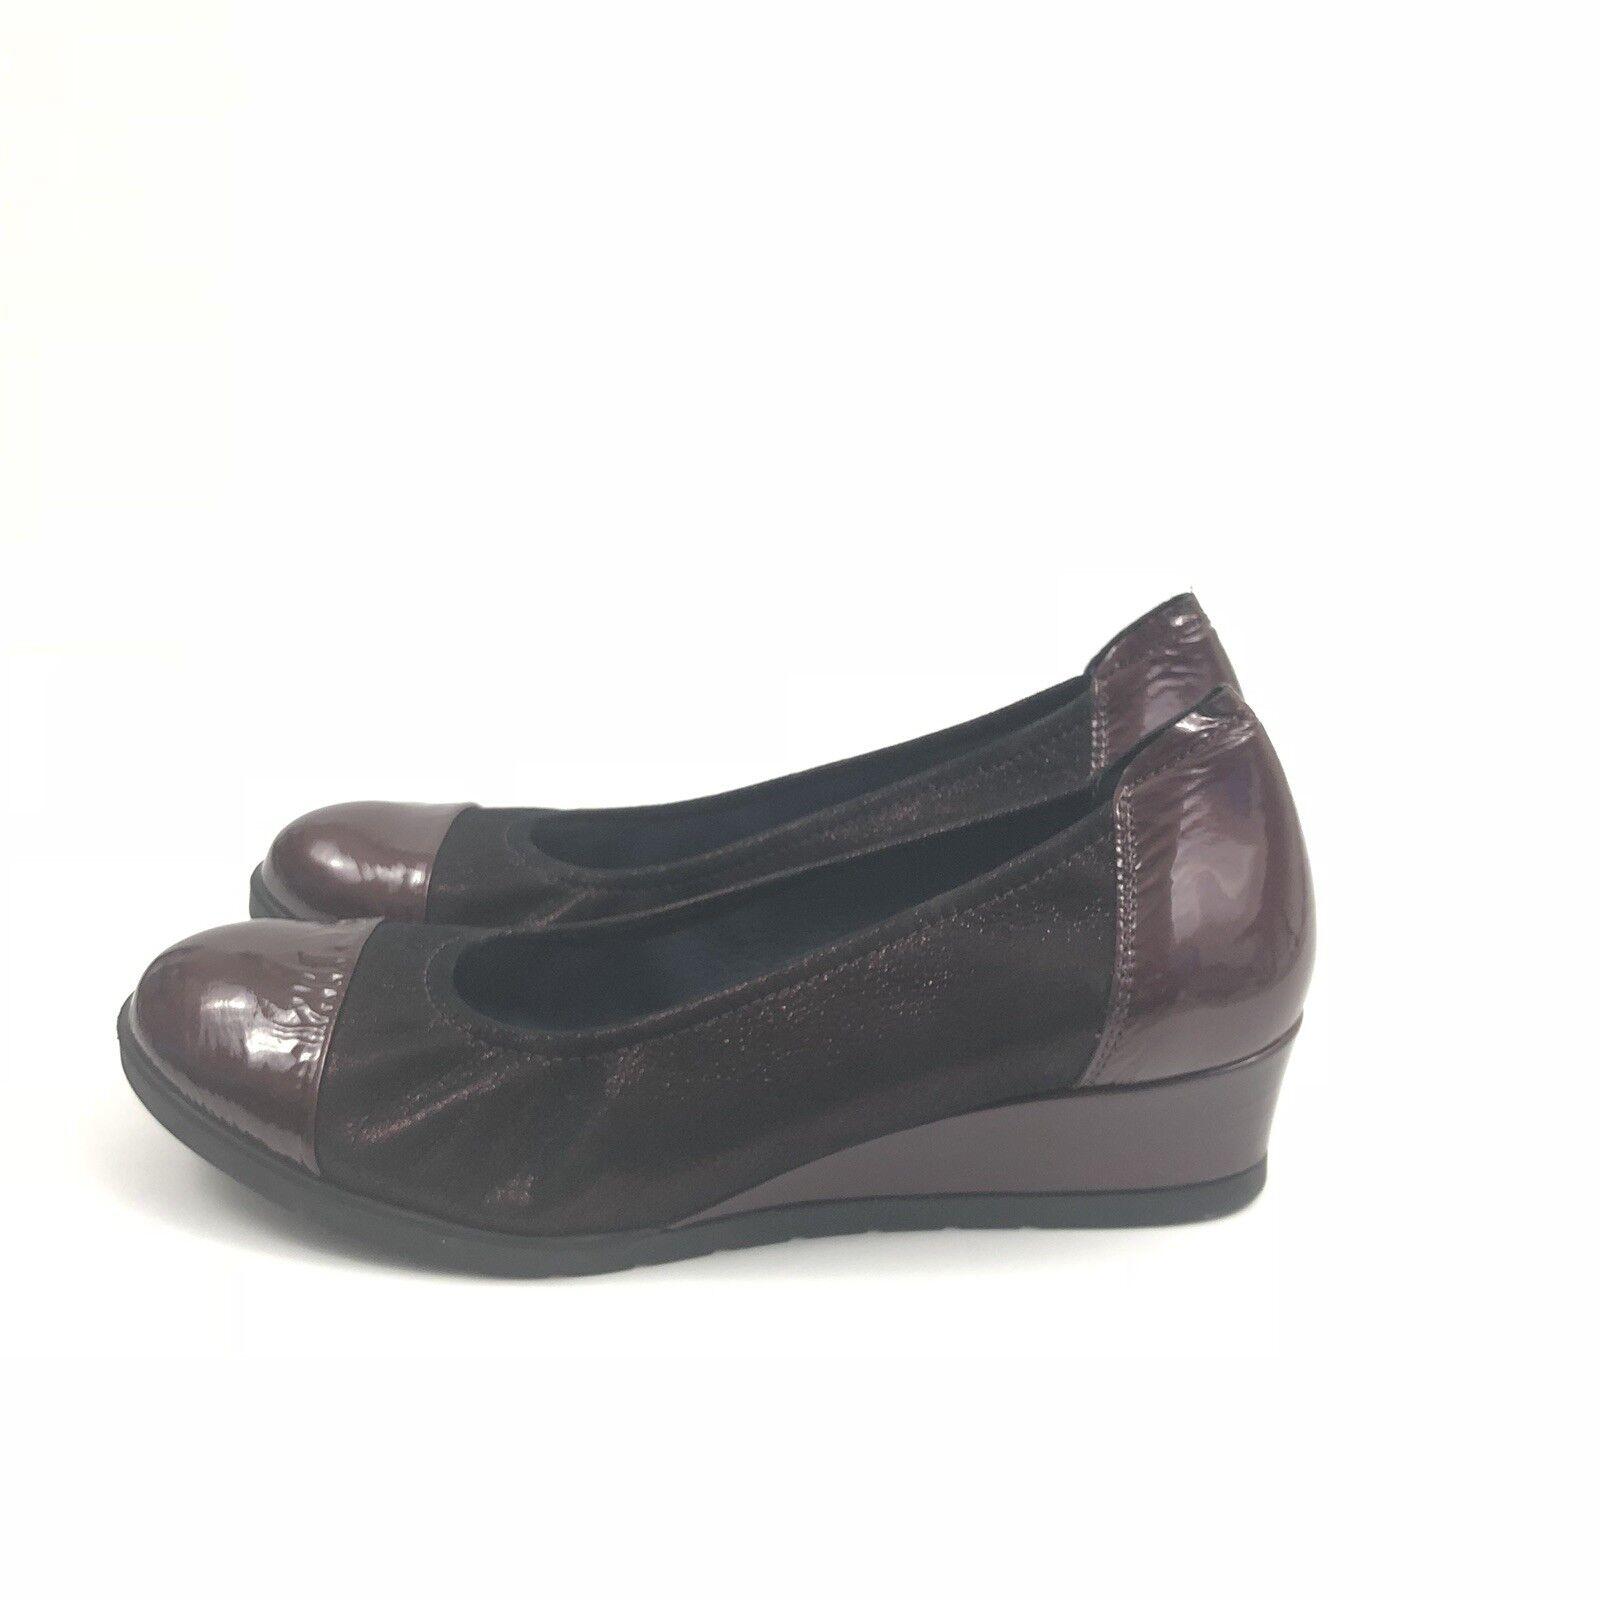 Sabrinas London Damenschuhe Größe 37 Toe Metallic Patent Leder Cap Toe 37 Heel Wedges fae3b2